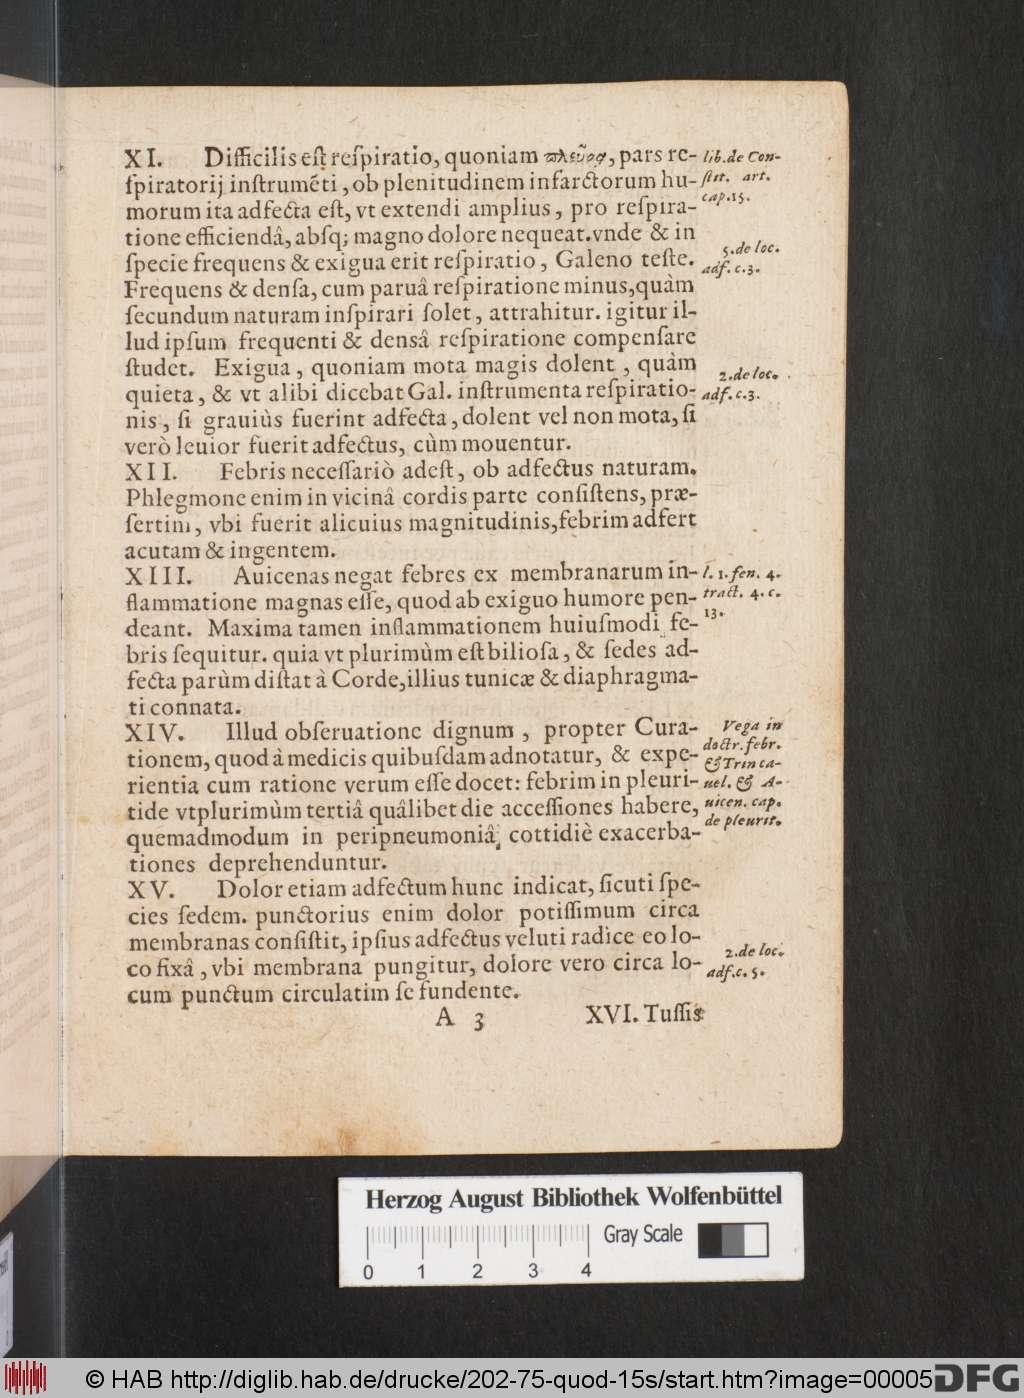 http://diglib.hab.de/drucke/202-75-quod-15s/00005.jpg